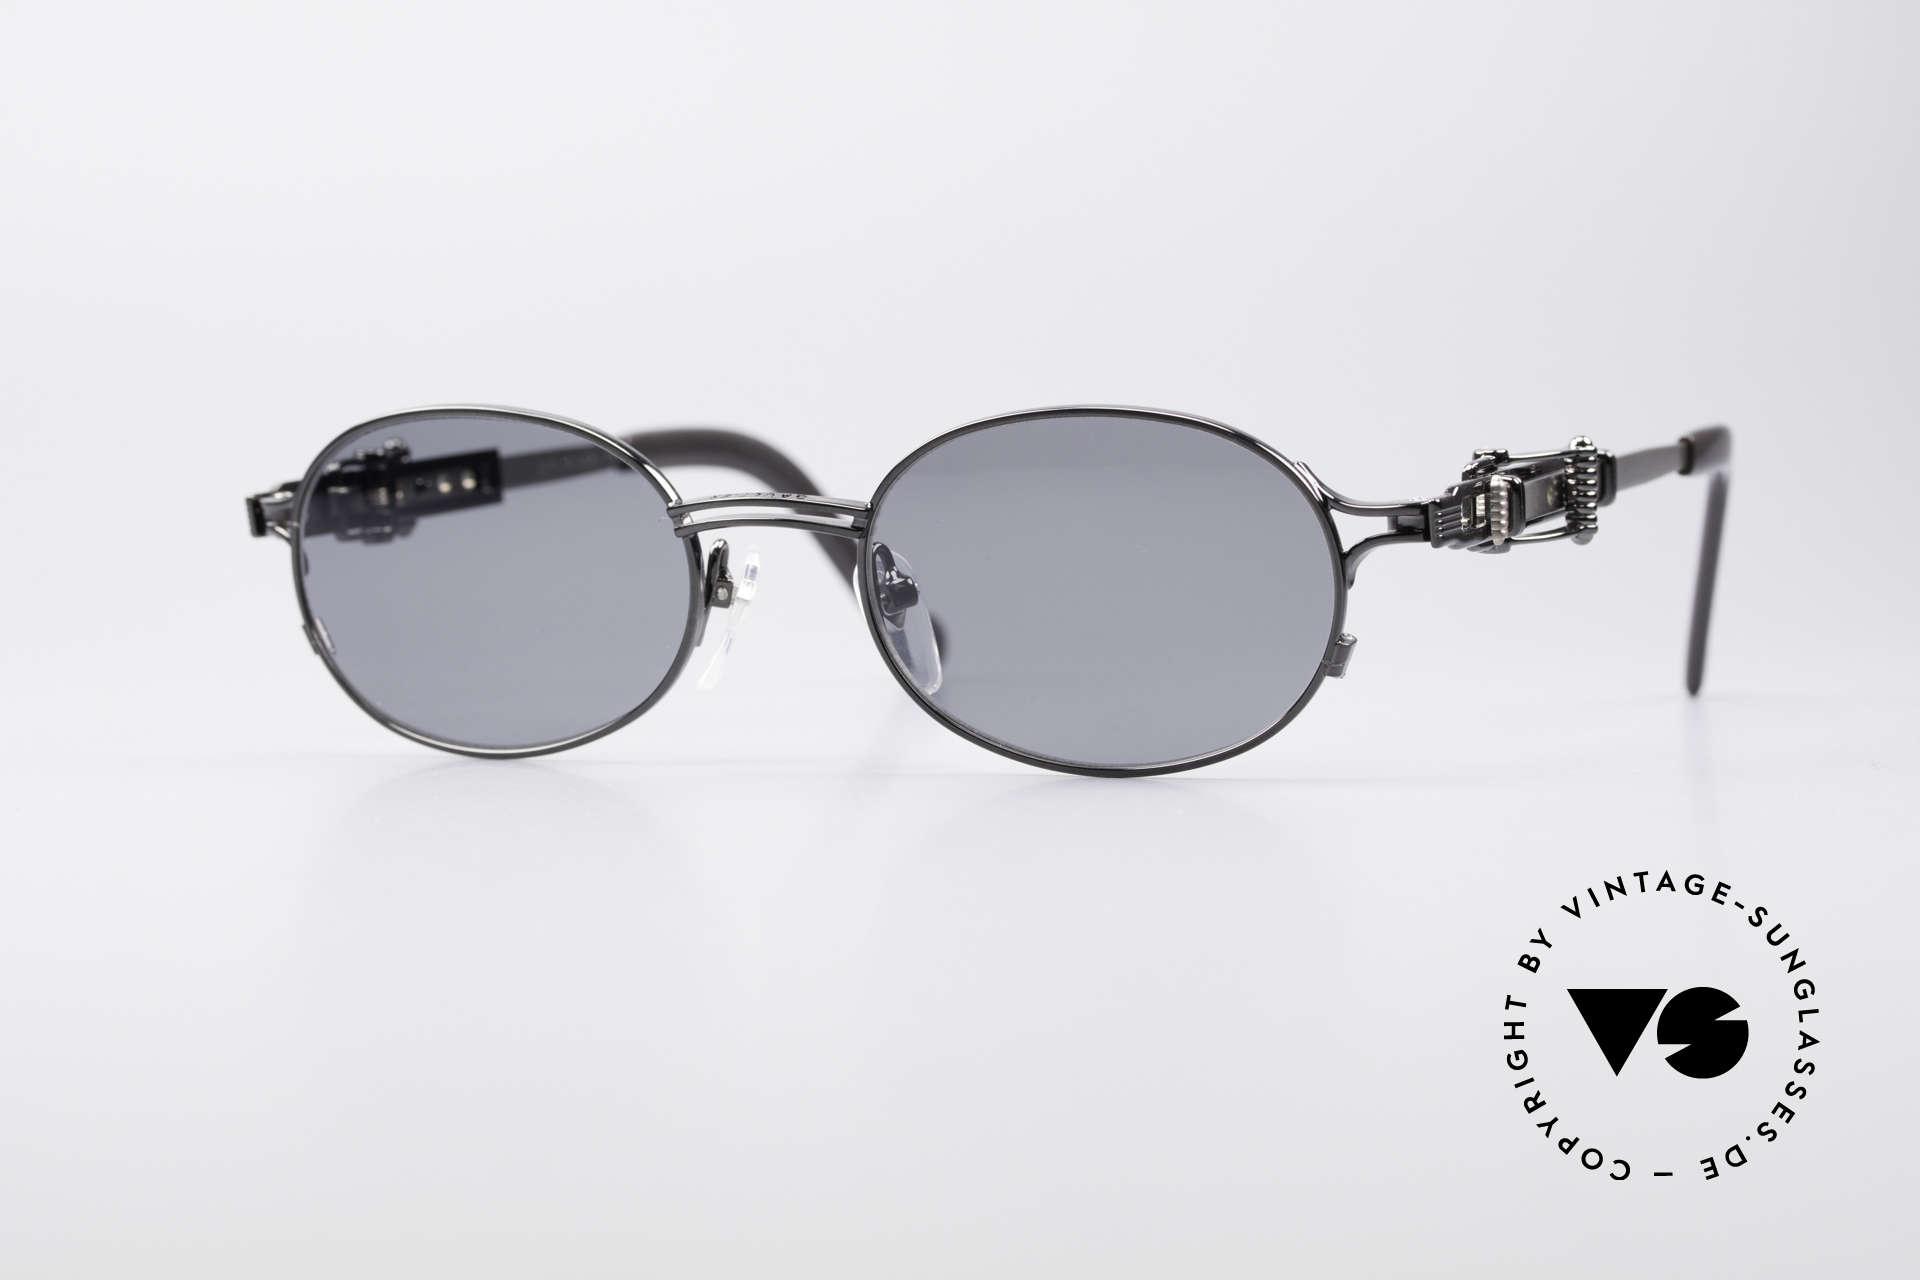 Jean Paul Gaultier 56-0020 Oval Belt Buckle Frame, vintage Jean Paul Gaultier sunglasses from 1996, Made for Men